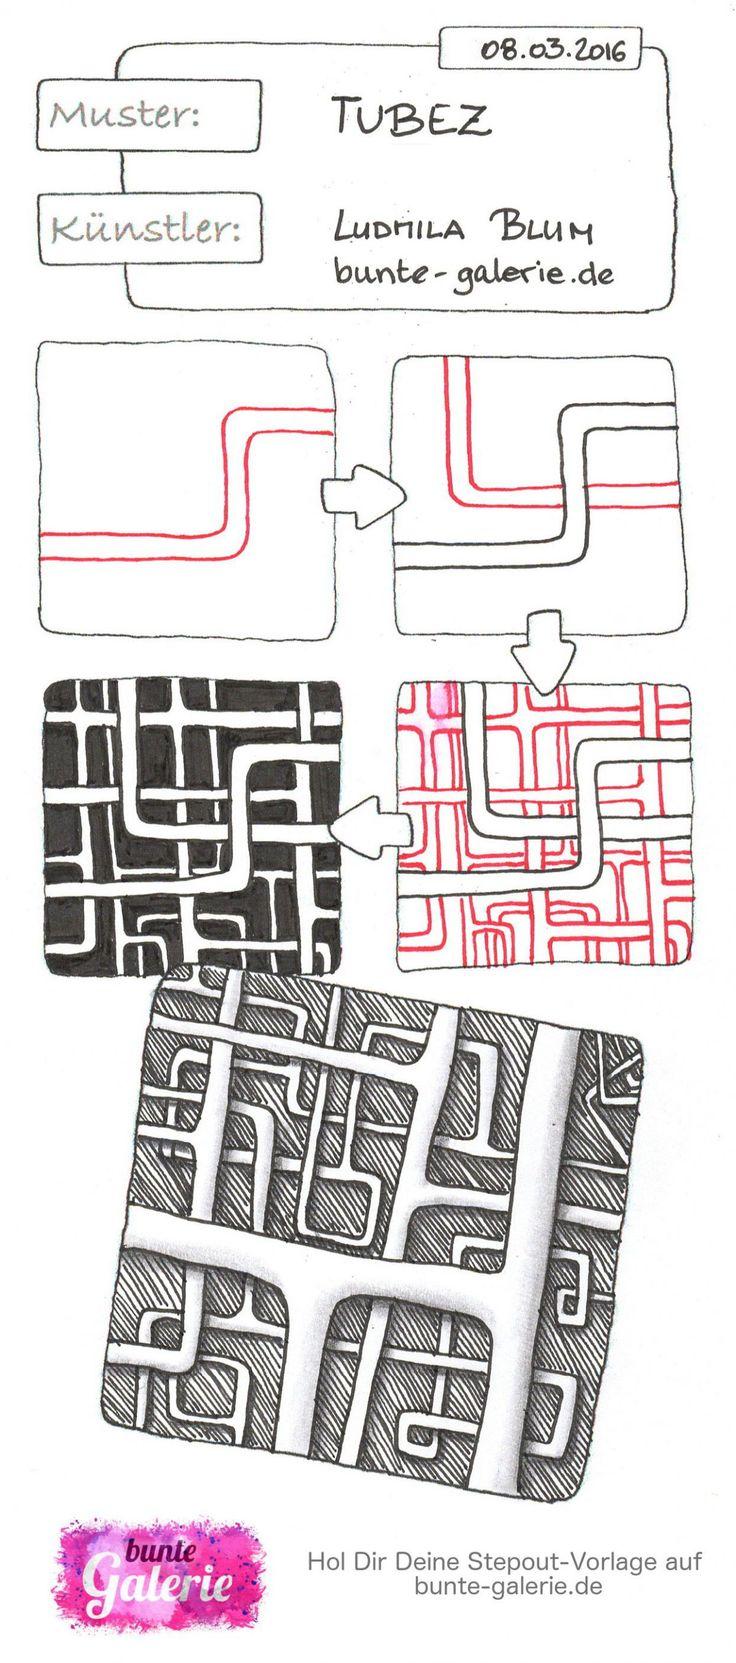 Stepout für Zentangle Muster Tubez von Ludmila Blum  Tuber tangle pattern                                                                                                                                                      More